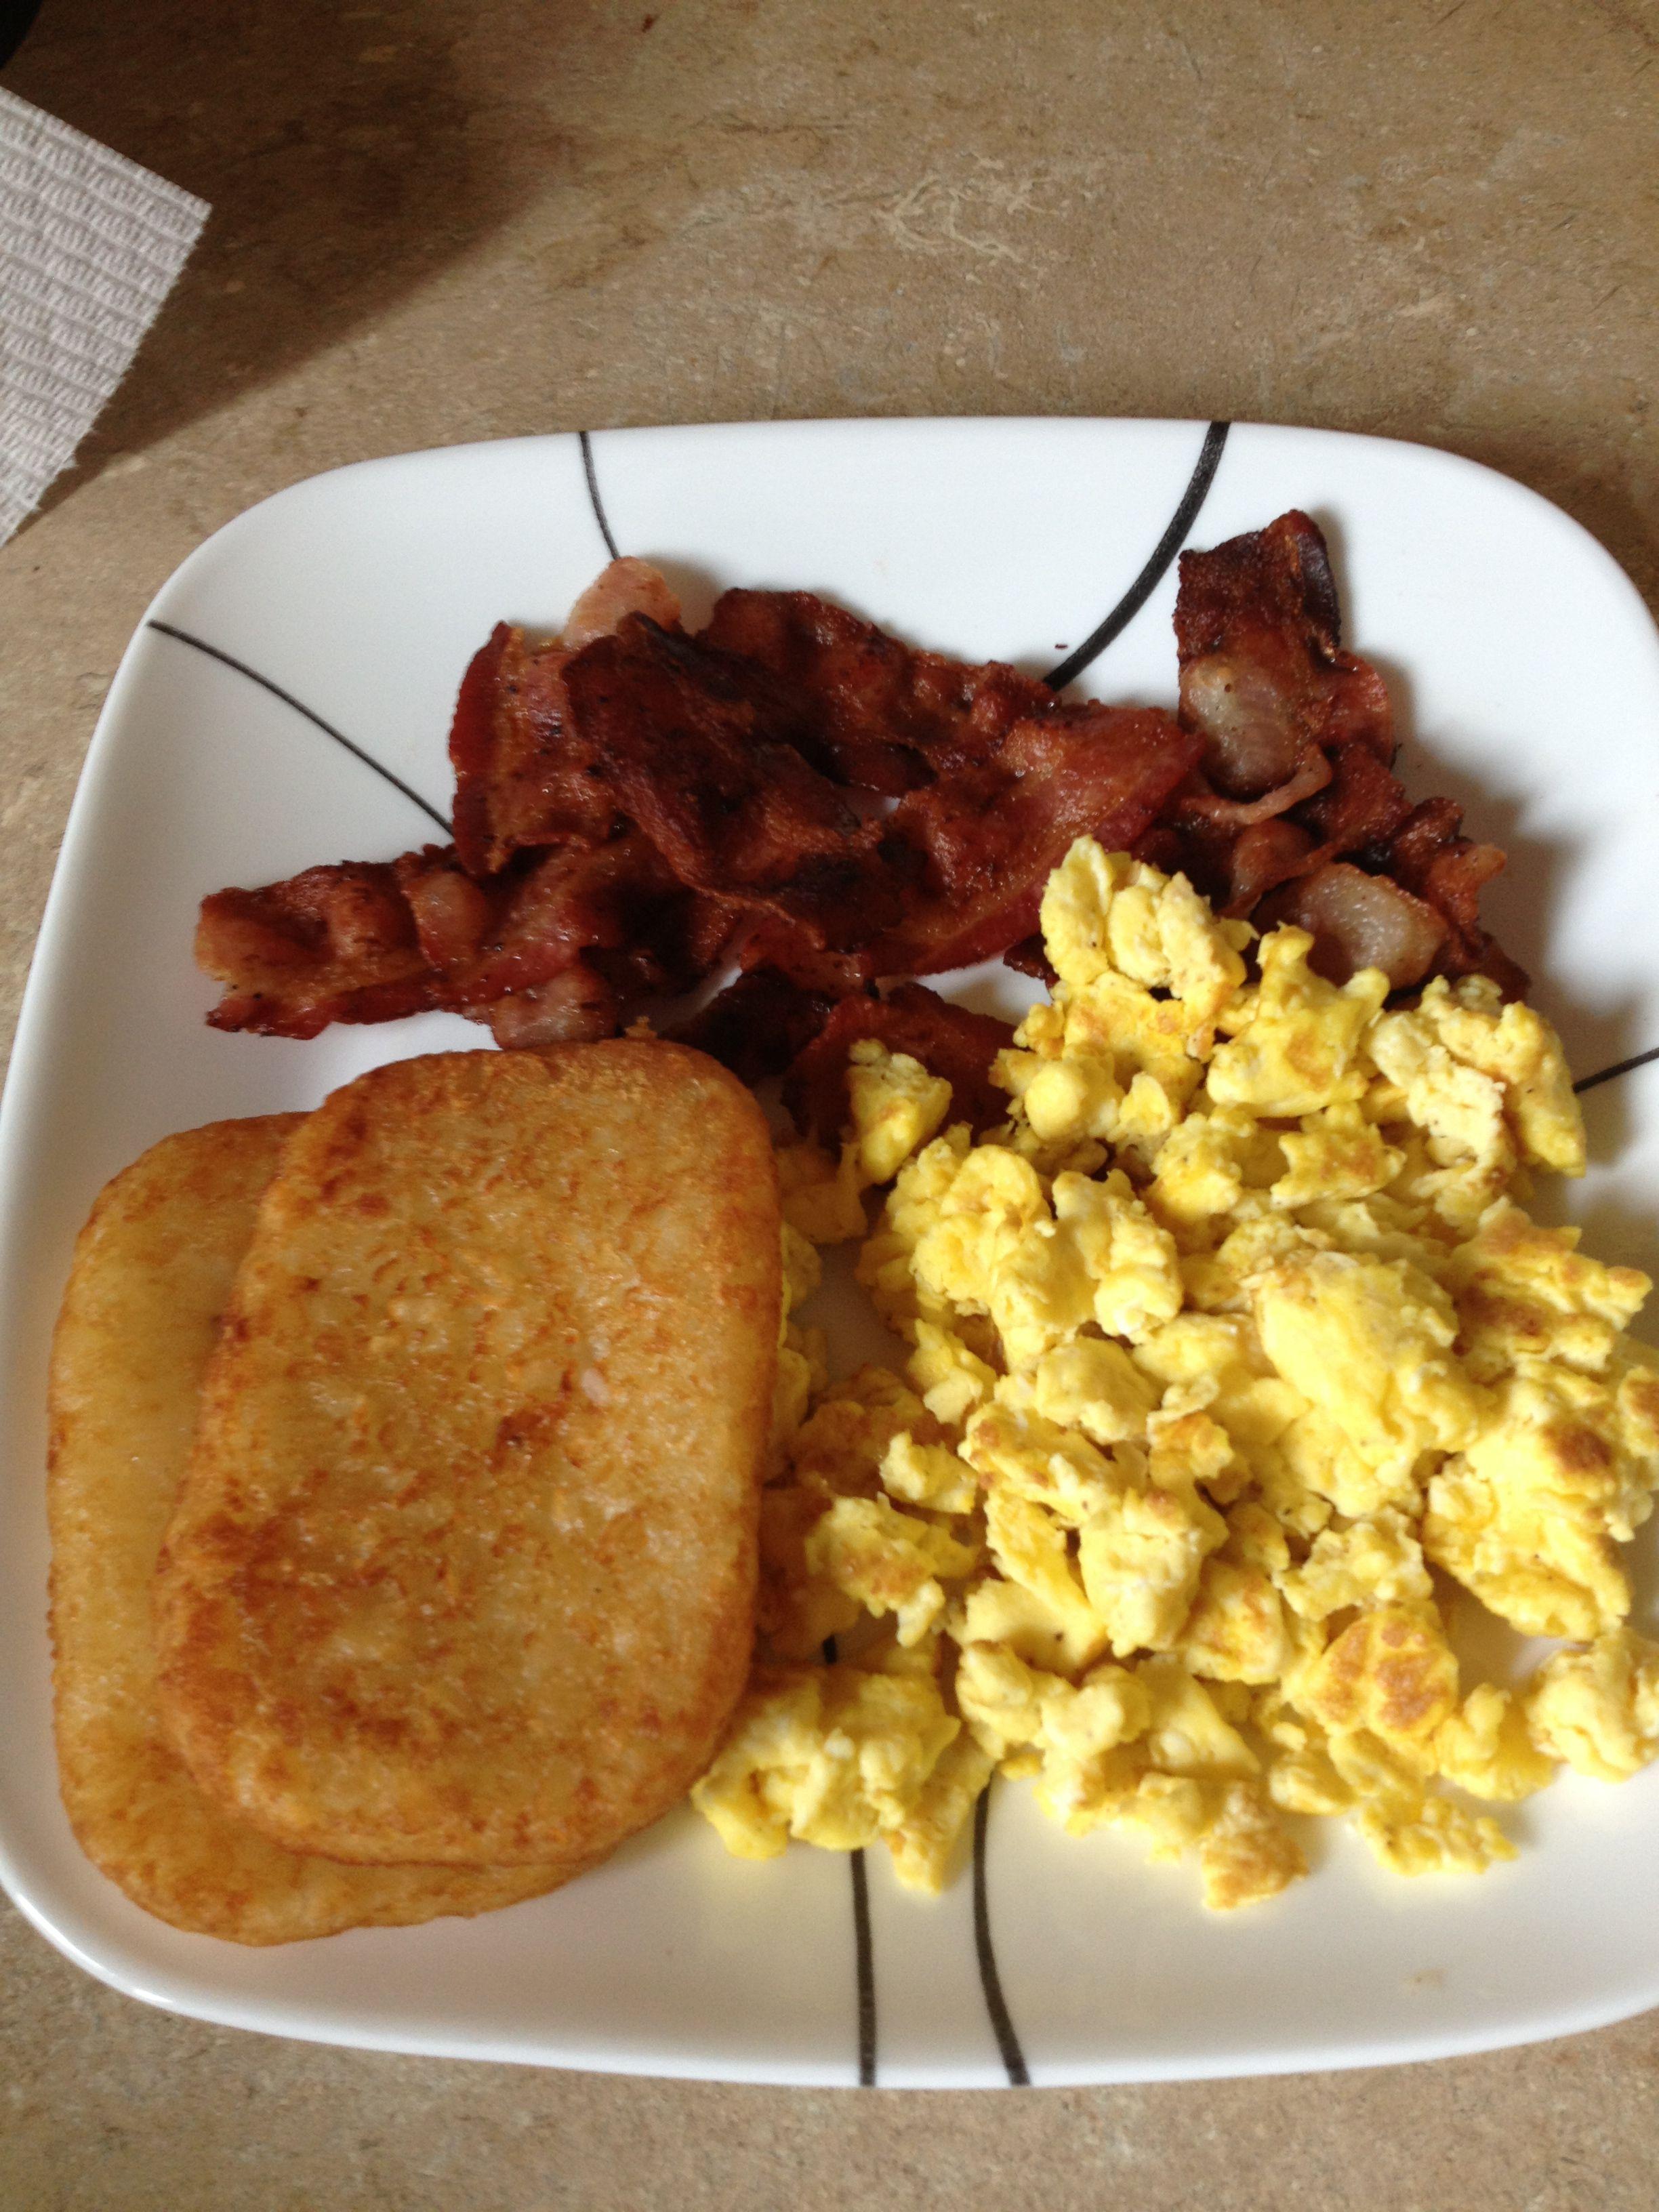 Bacon, scrambled eggs & hashbrowns | Fav Foods | Pinterest